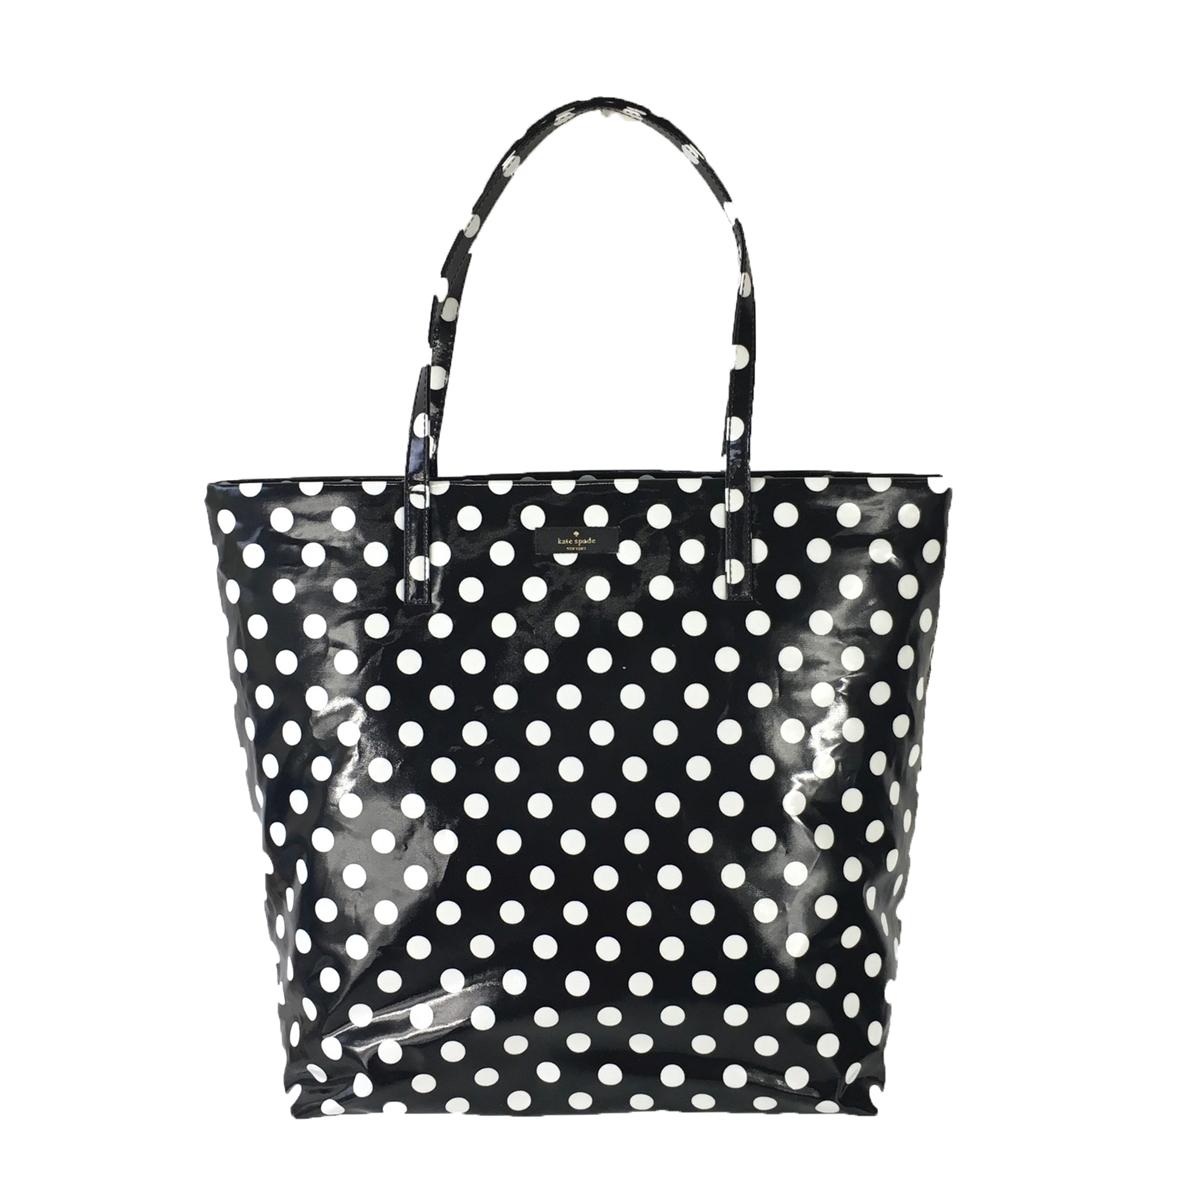 Kate spade polka dot bon shopper tote black cream junglespirit Choice Image